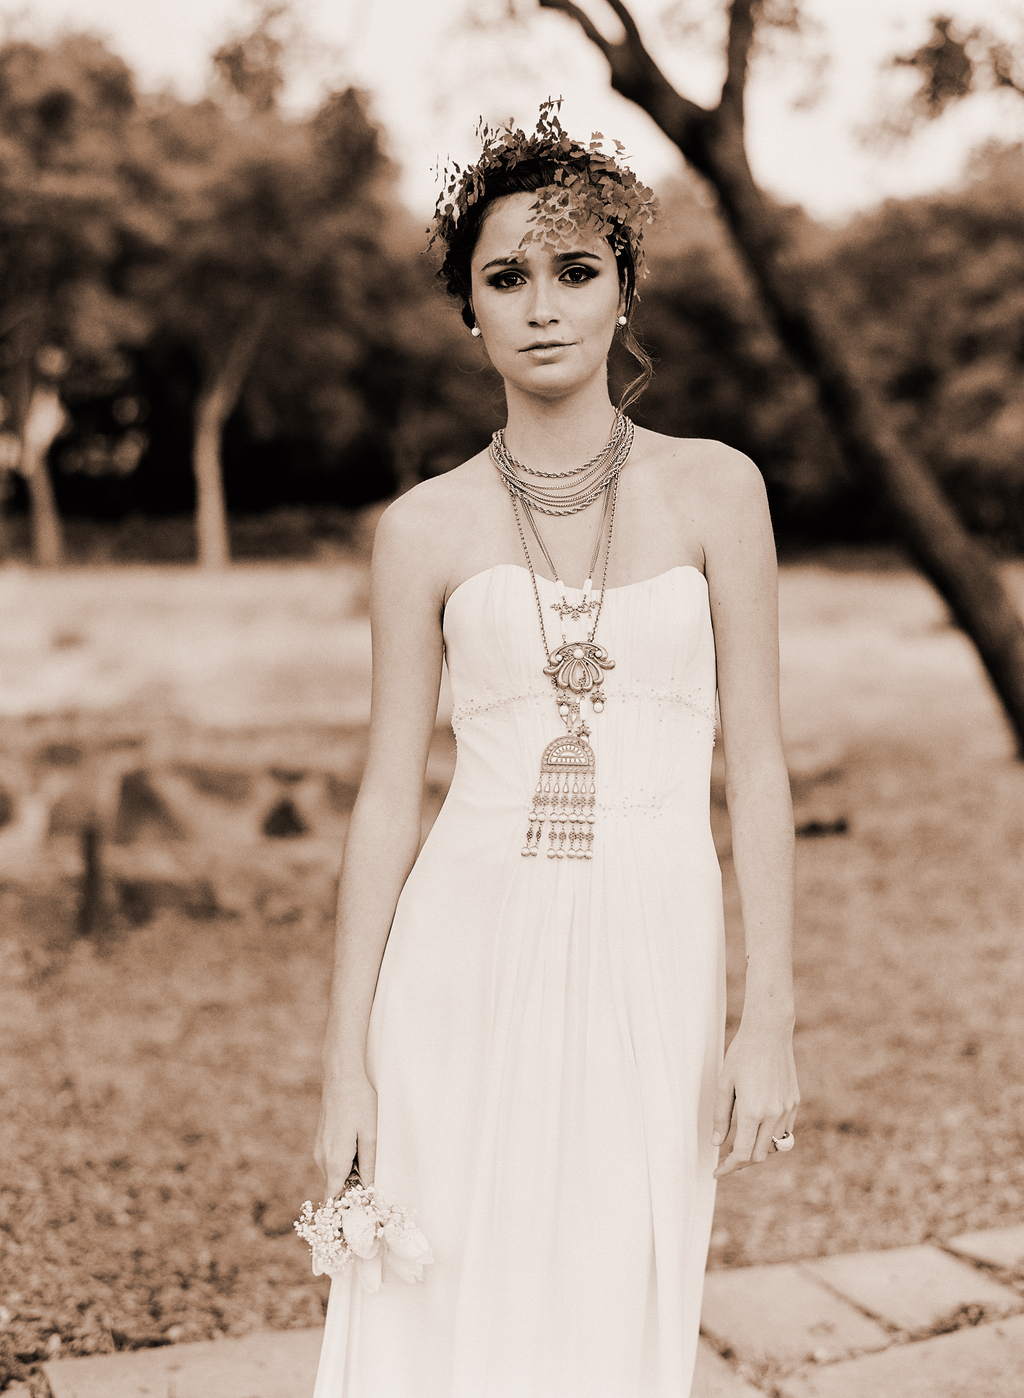 Styled-wedding-santa-barbara-chic-beaux-arts-phtographie-italian-bohemian-wedding-bride-wedding-dress--sepia-115.full